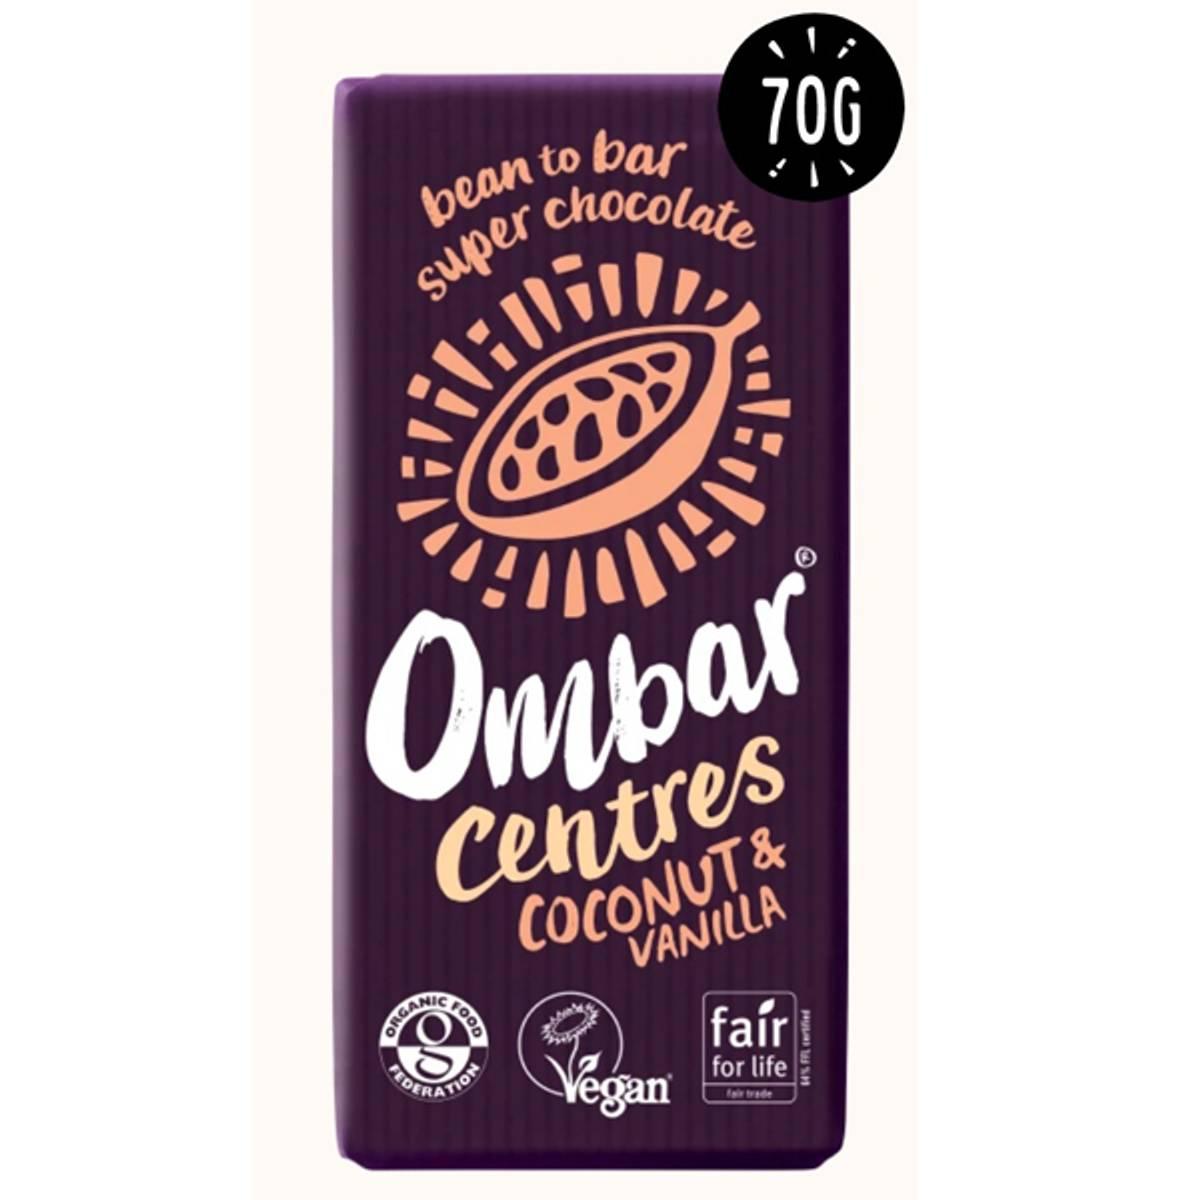 Ombar Centes Coconut & Vanilla 70 gram